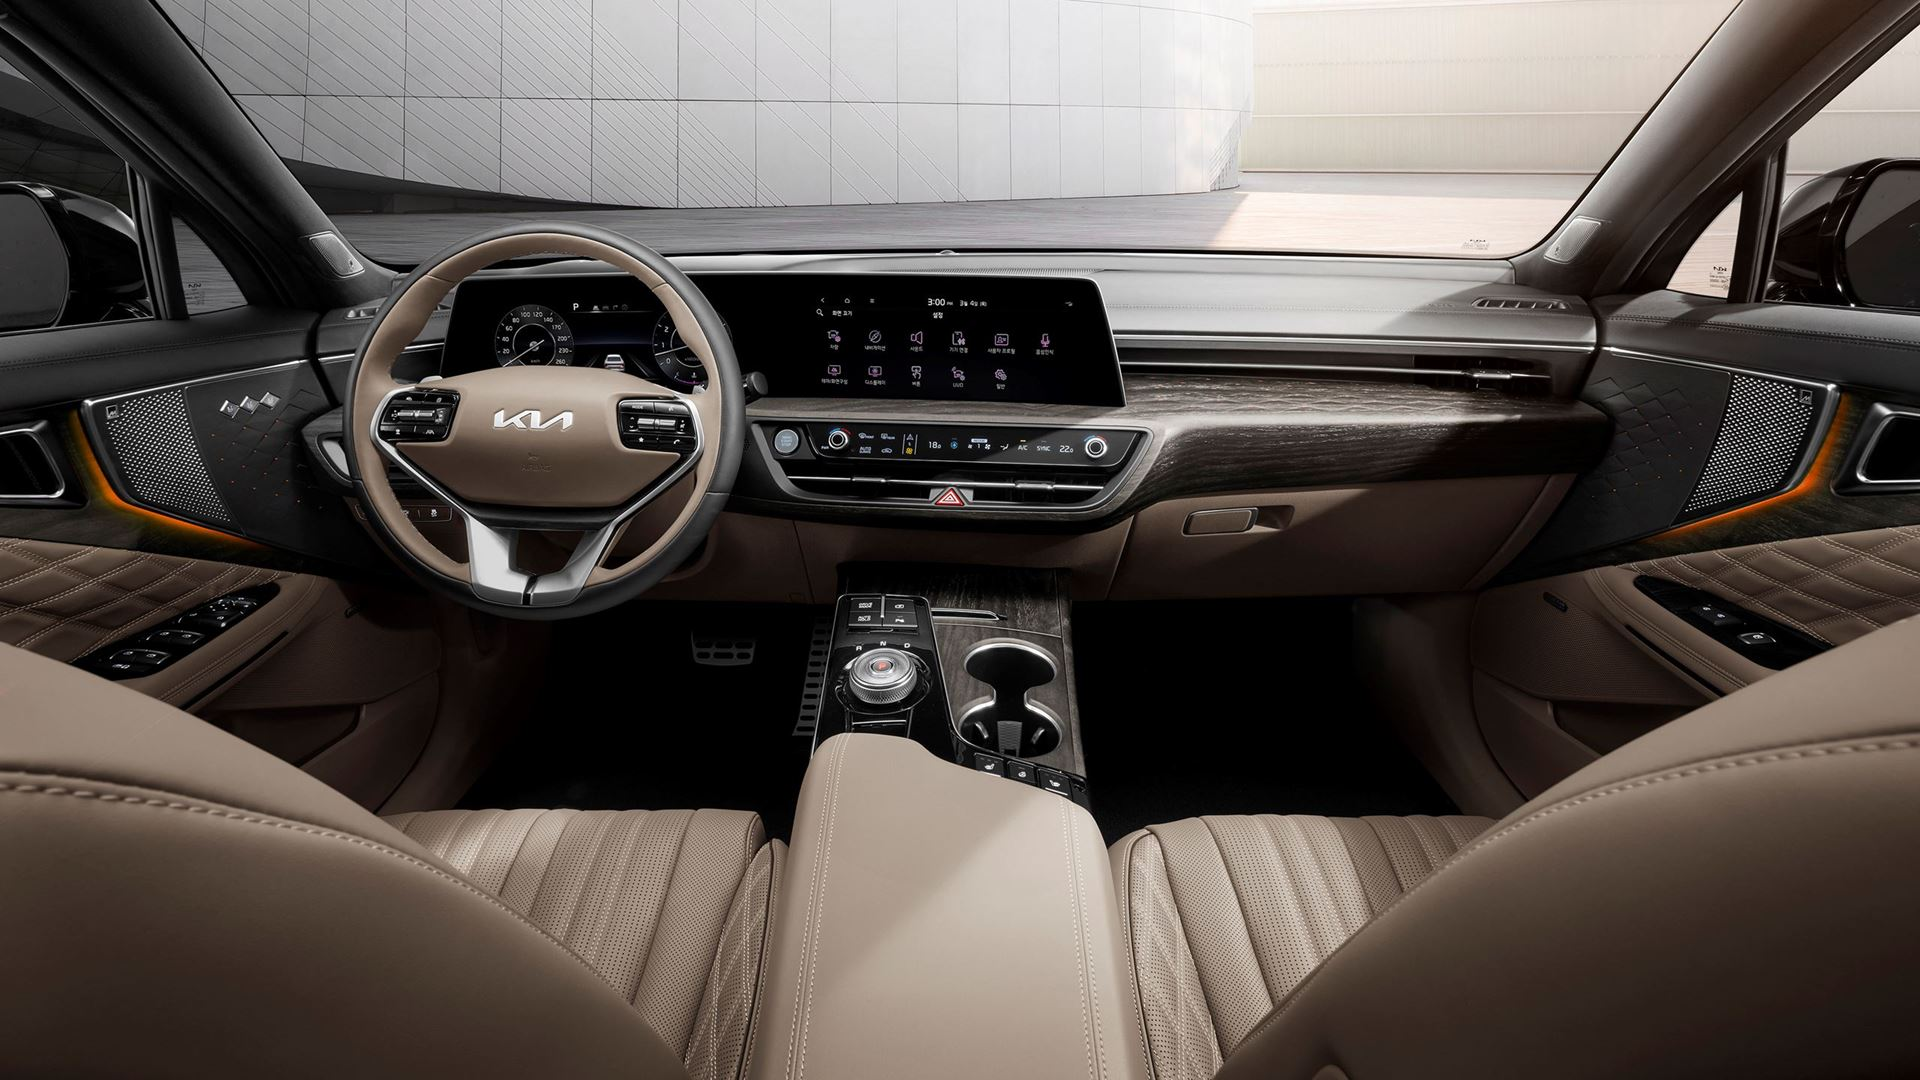 Kia K8 interior – modernity and technology meet in a luxury sports sedan - Image 1